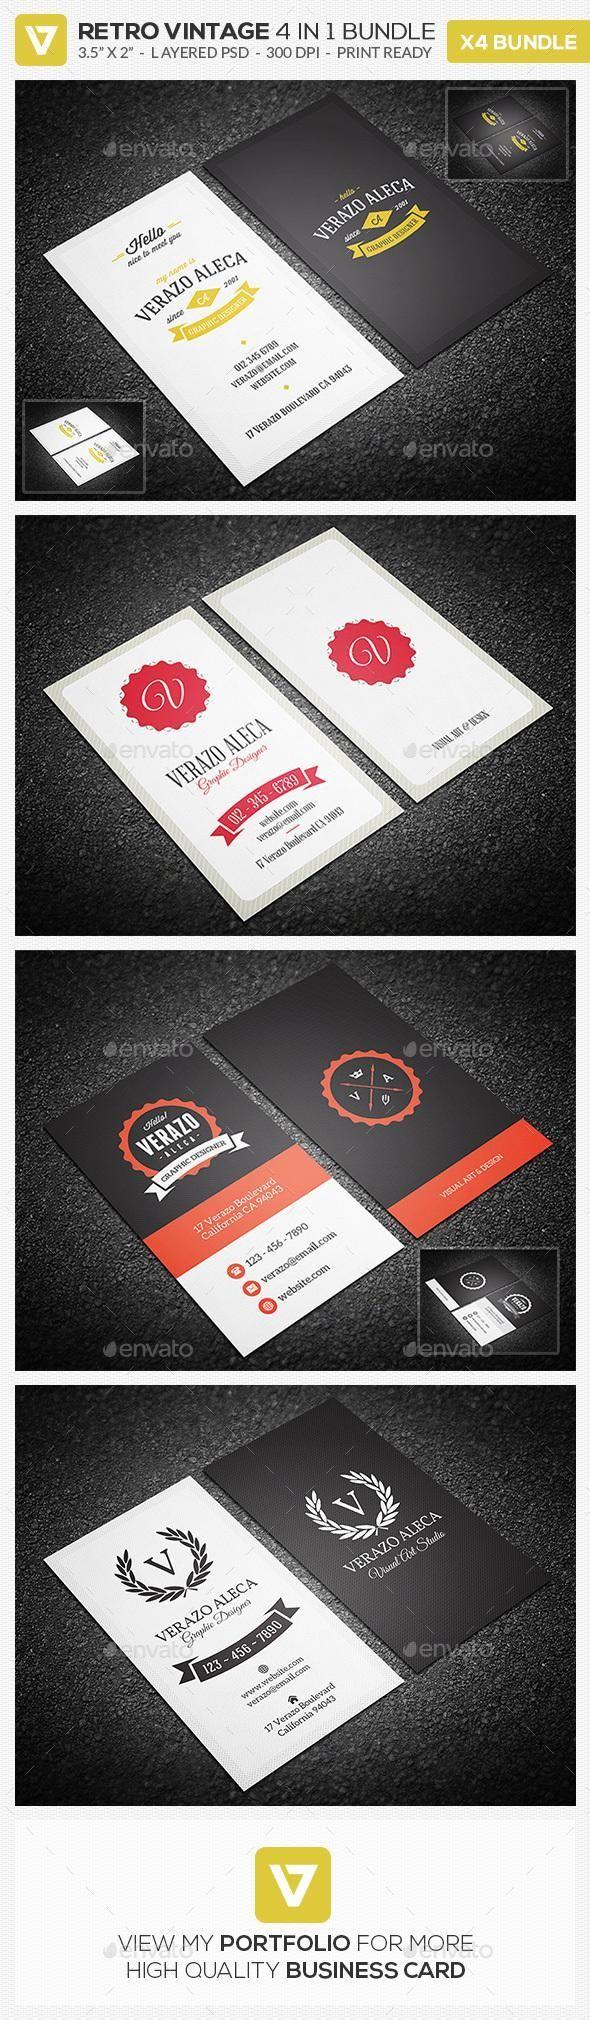 Retro Business Card Bundle Business Cards Retro Retro Business Card Printing Business Cards